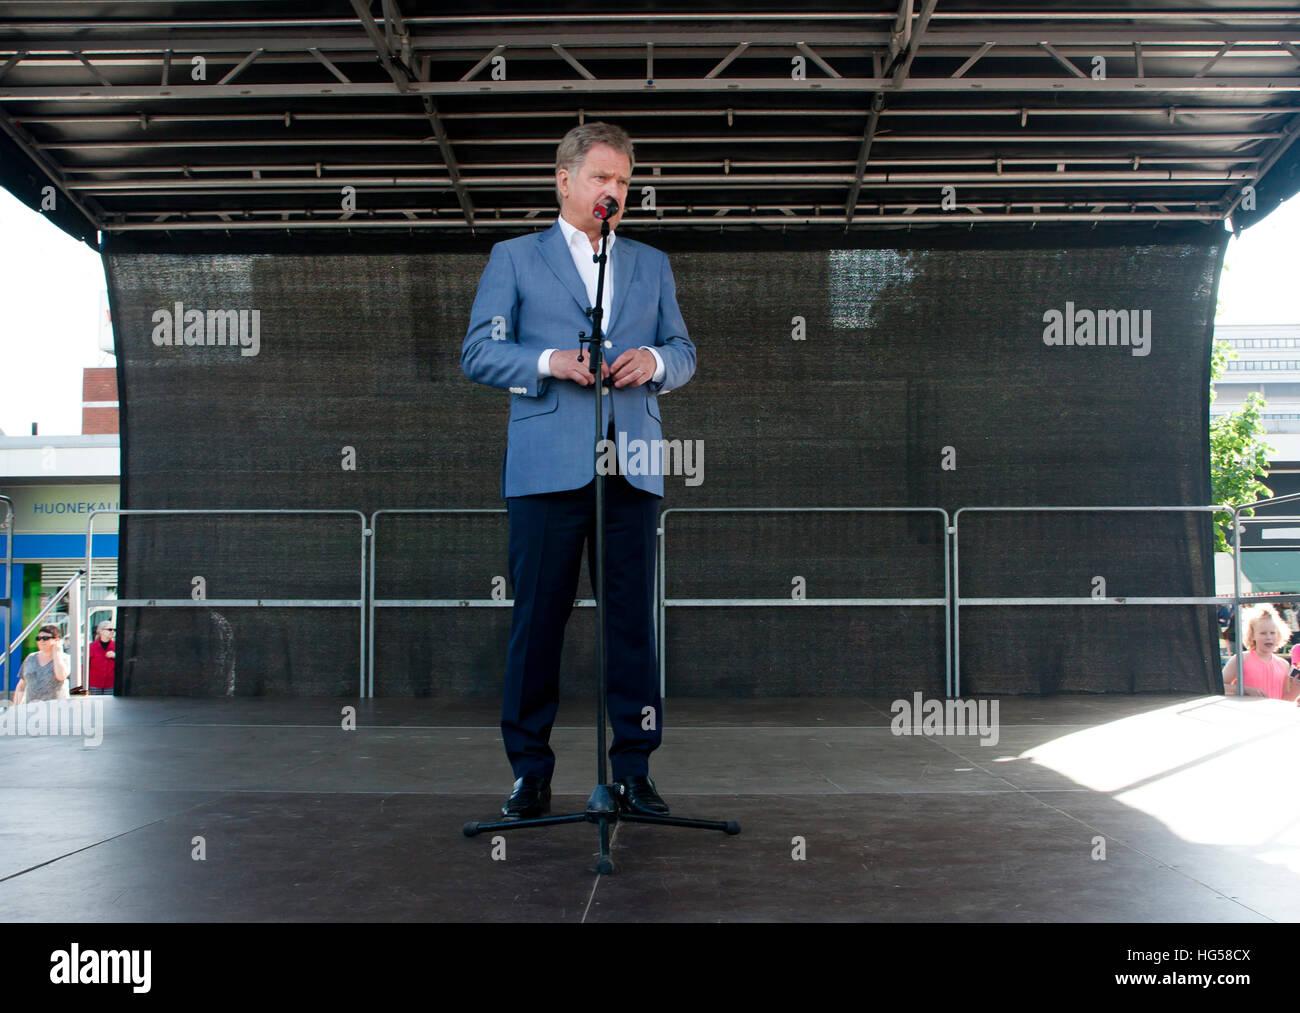 Kouvola, Finland - 30 May 2016: Sauli Niinisto, president of Finland visits the town Kouvola on May 30, 2016. Lamminmaki. - Stock Image